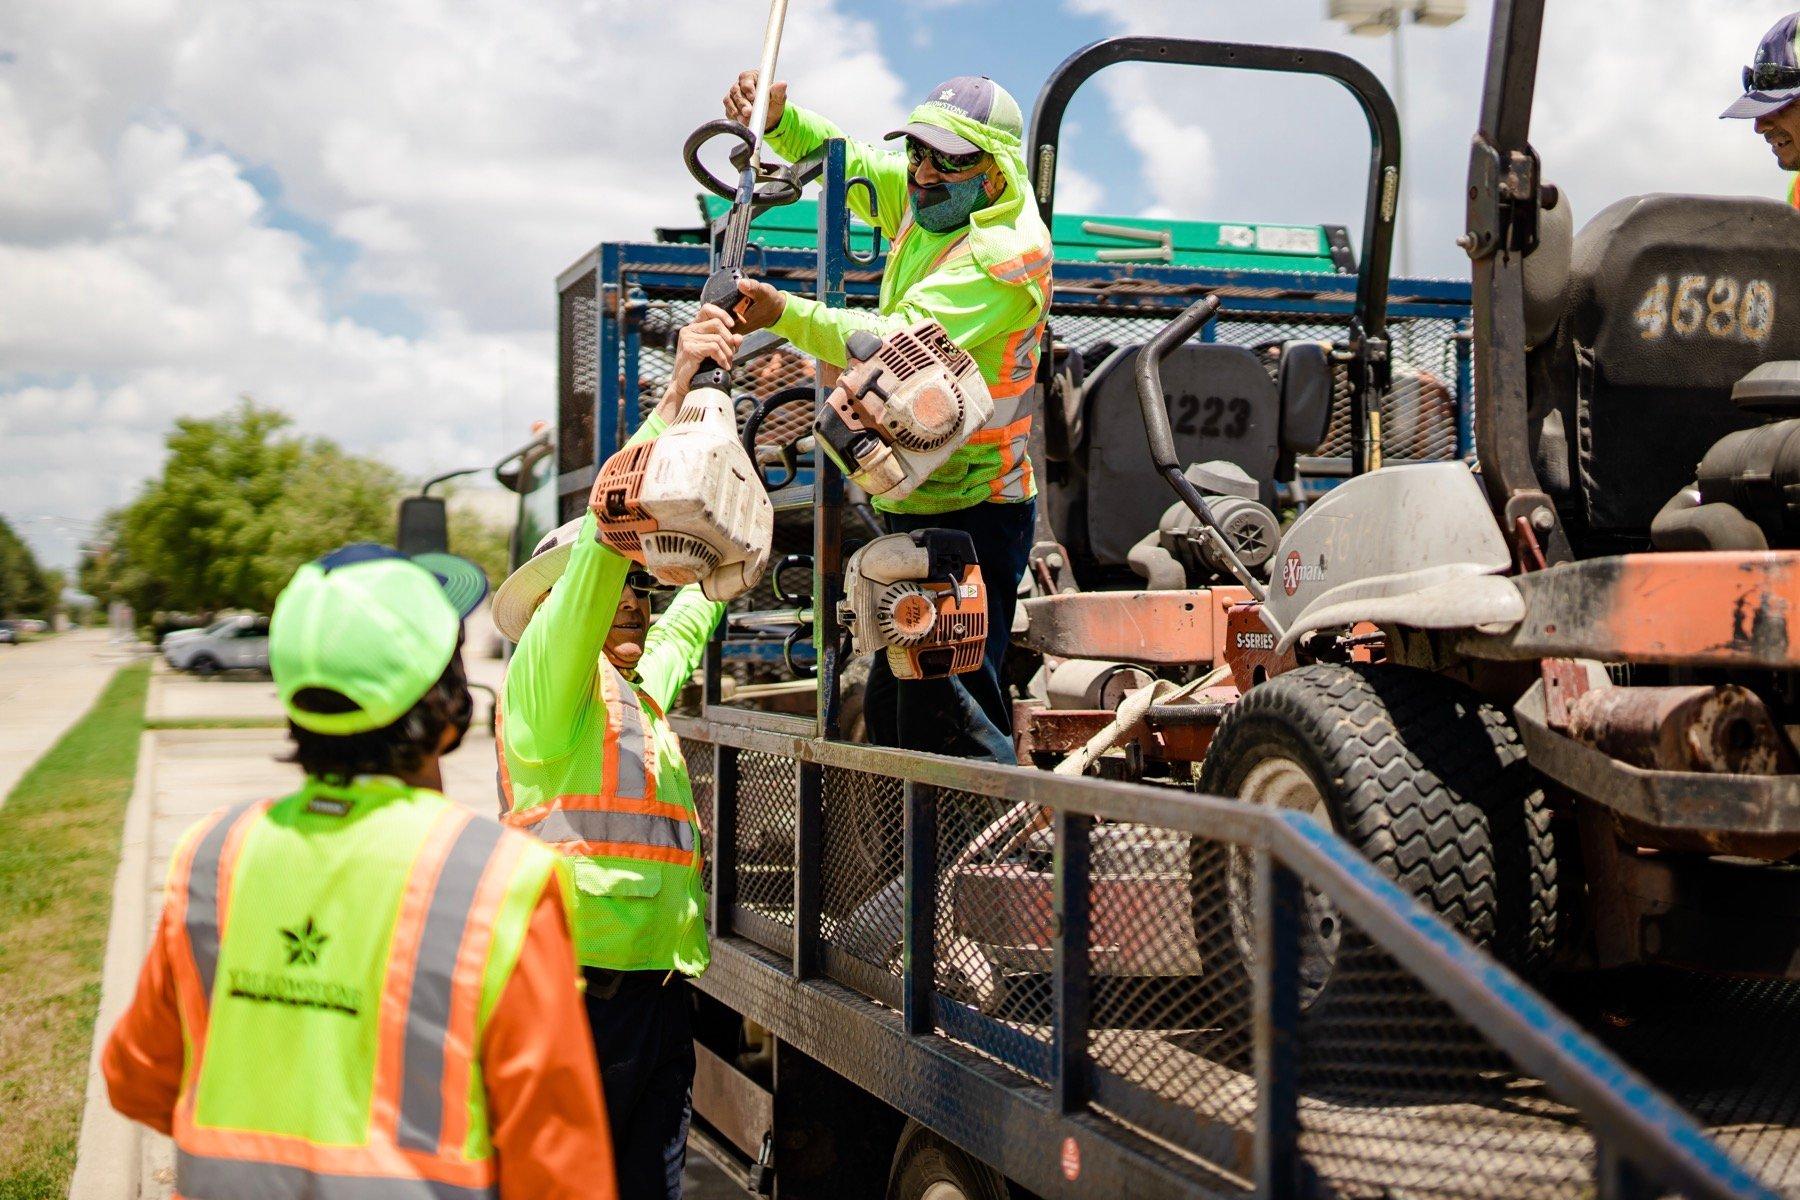 Landscape maintenance crew loading equipment onto a trailer